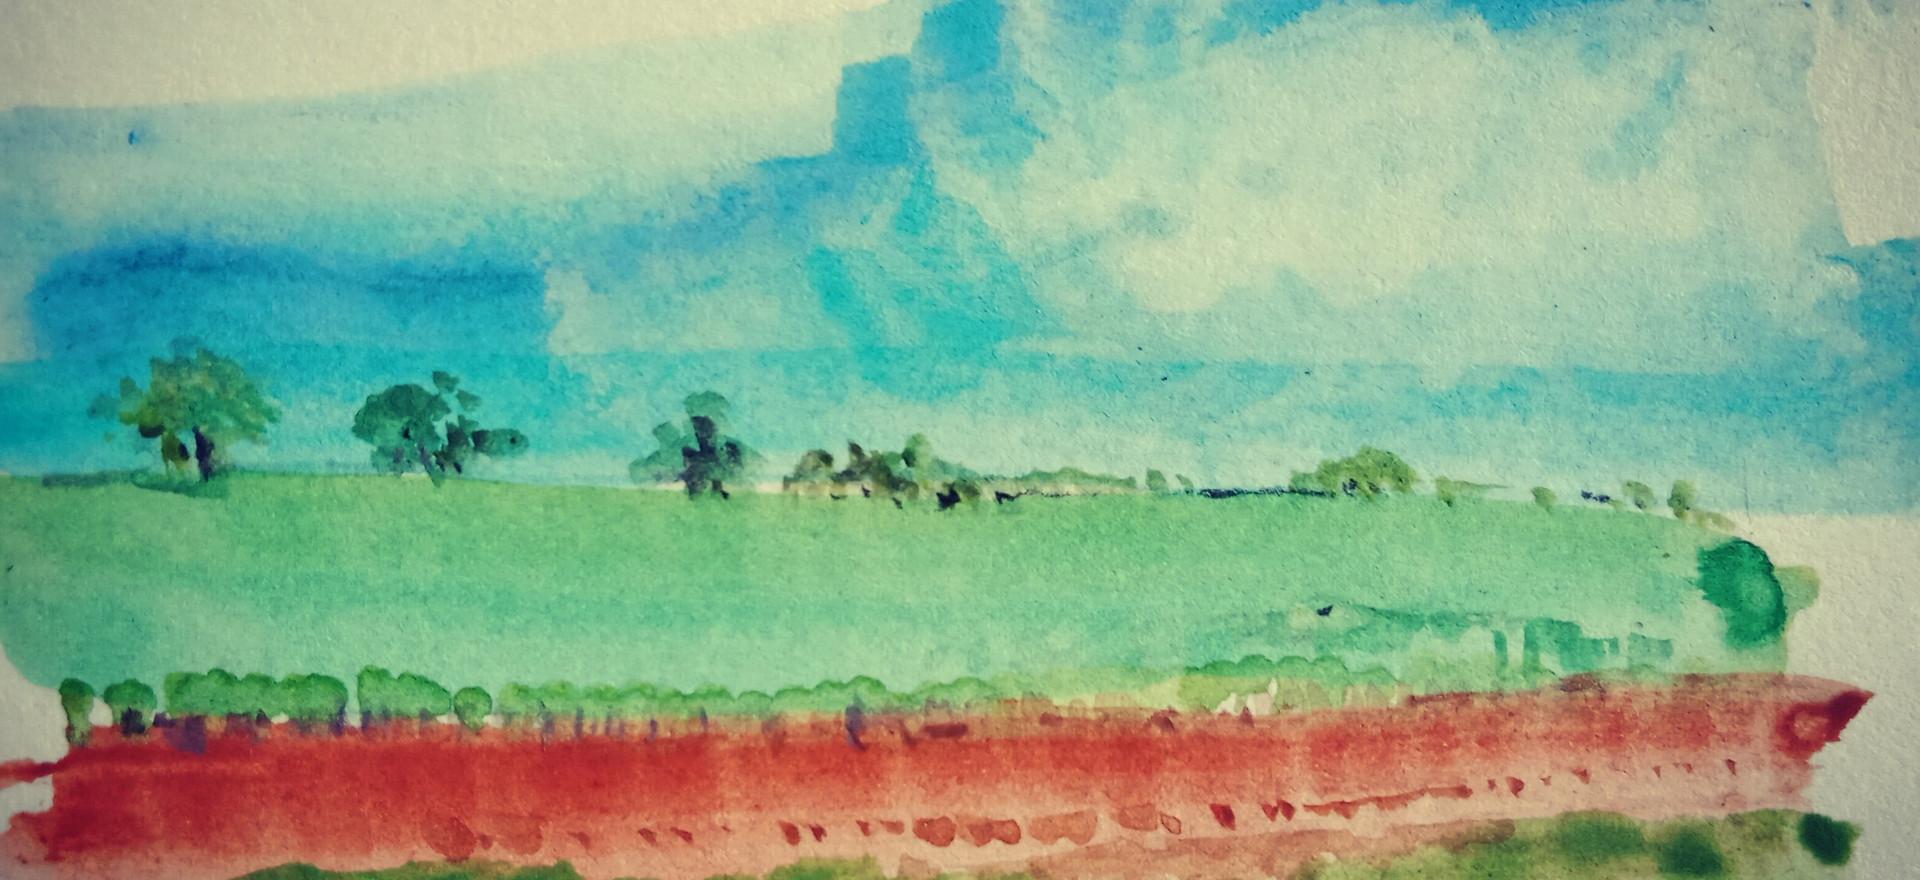 Yorkes landscape 3 small card.jpg